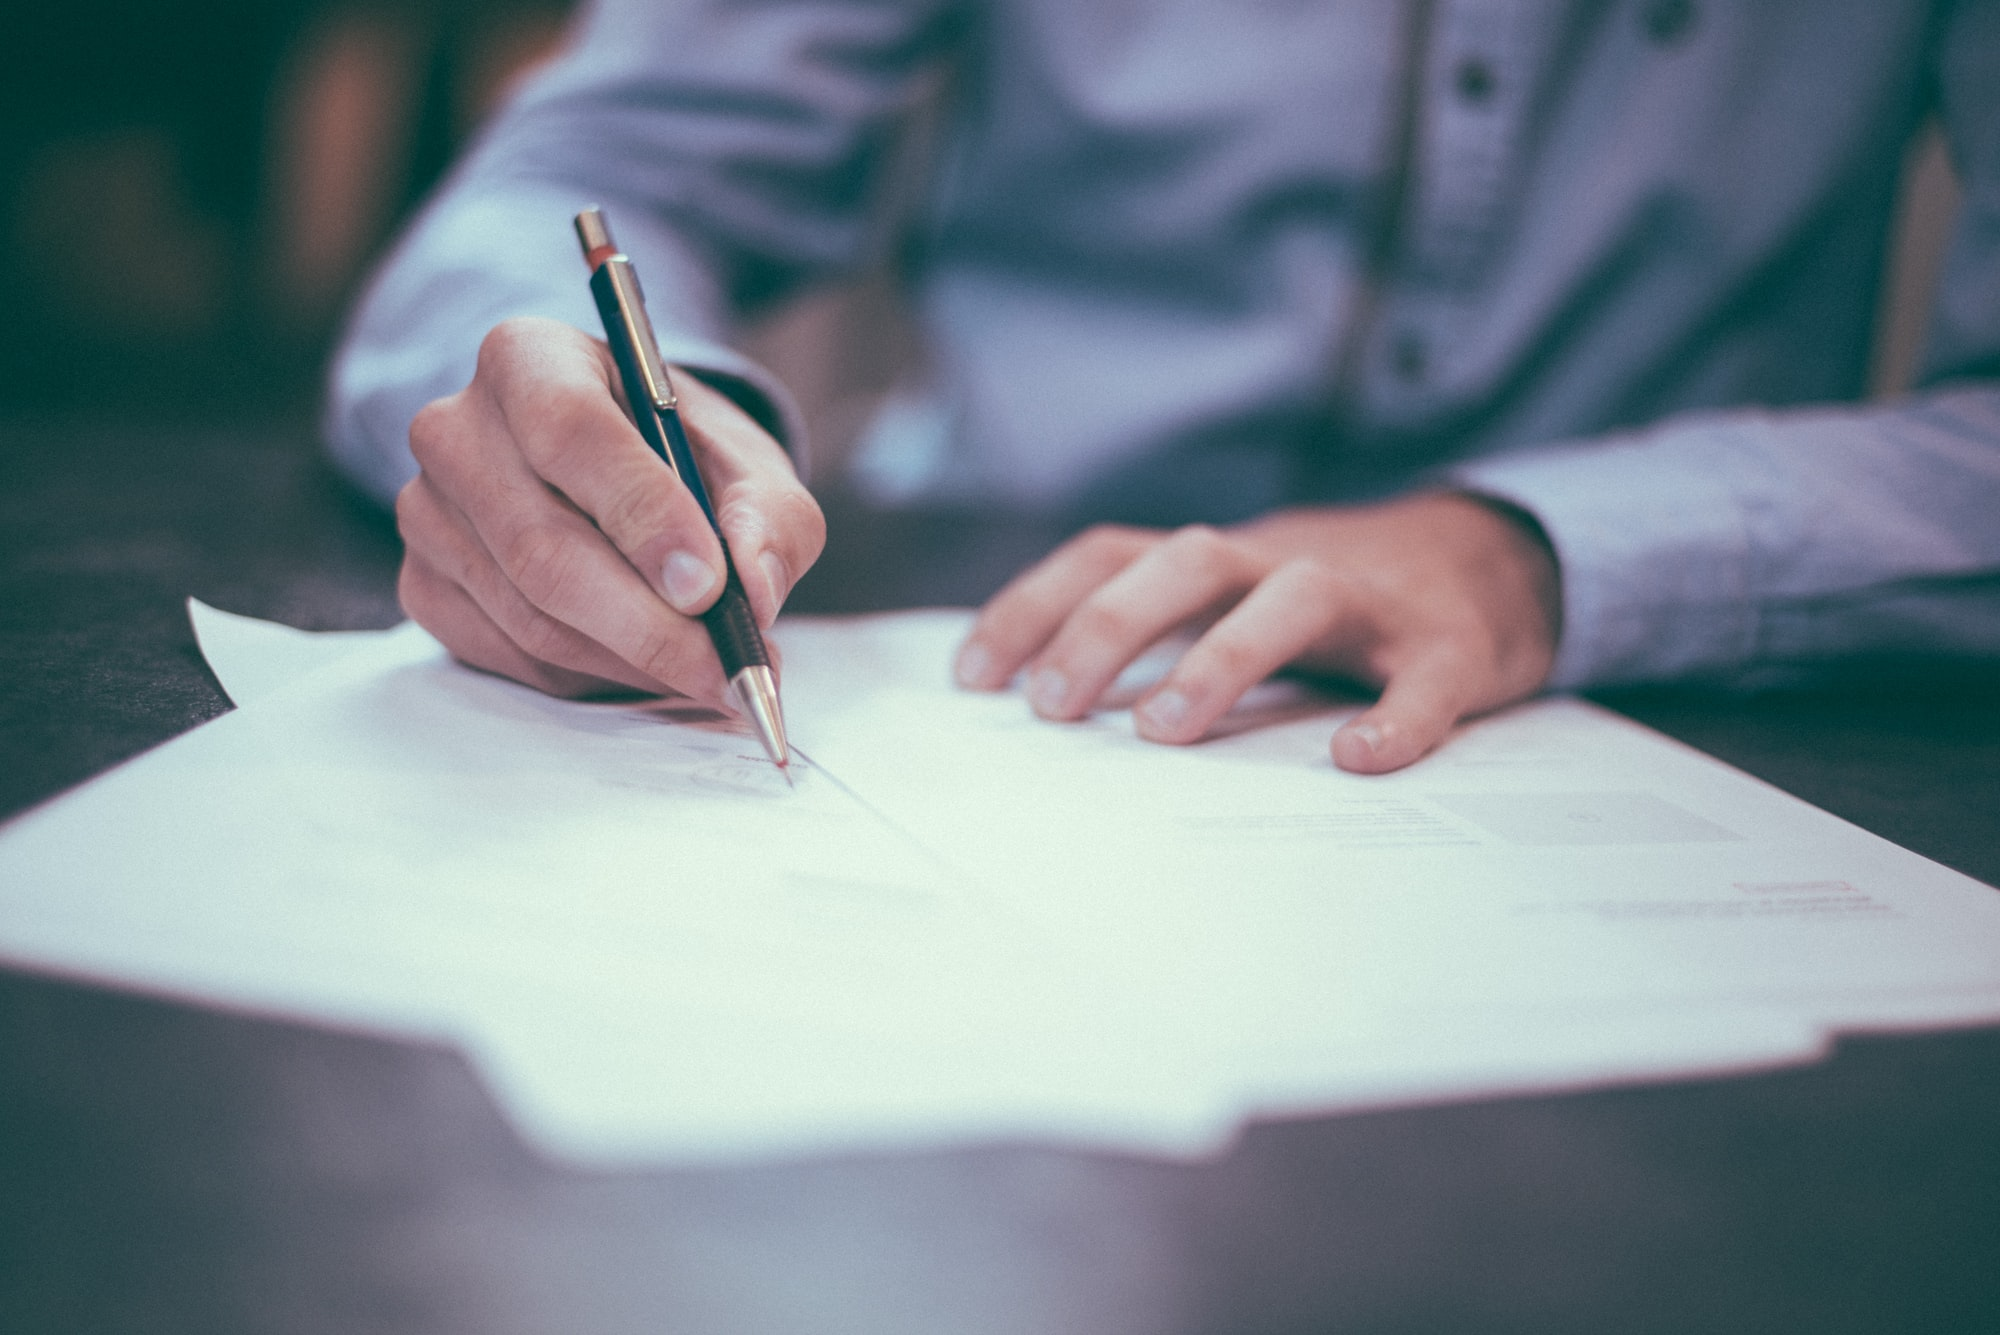 Perils of Electronic Signatures